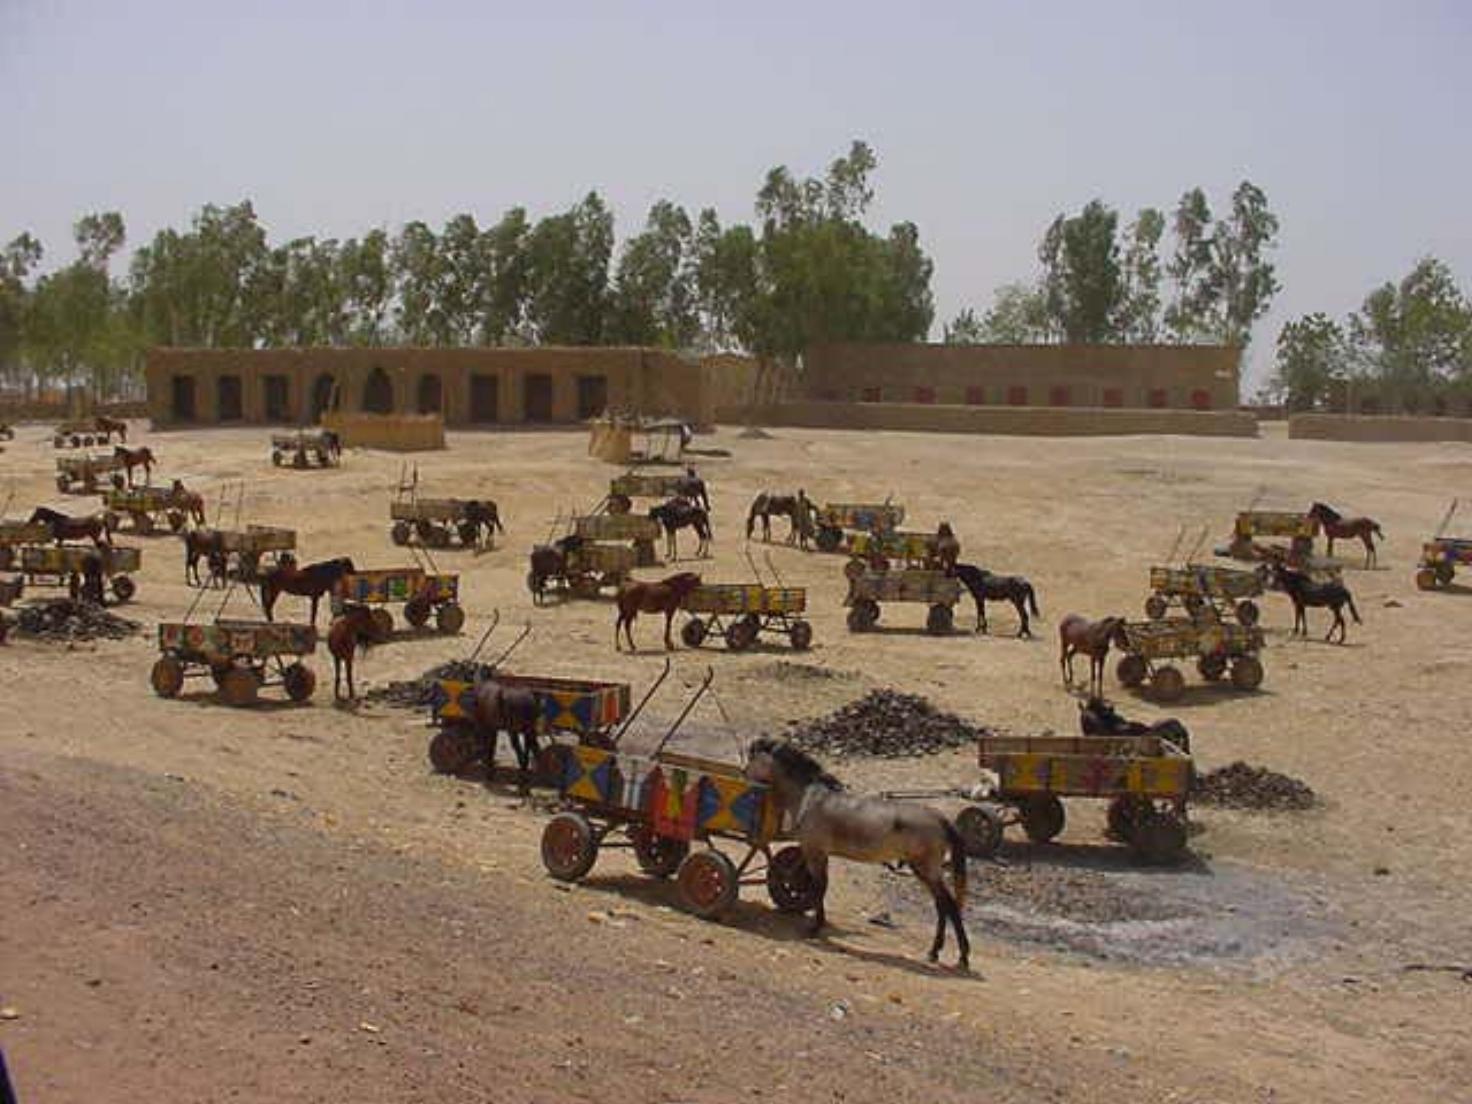 Carts await pick up of market items